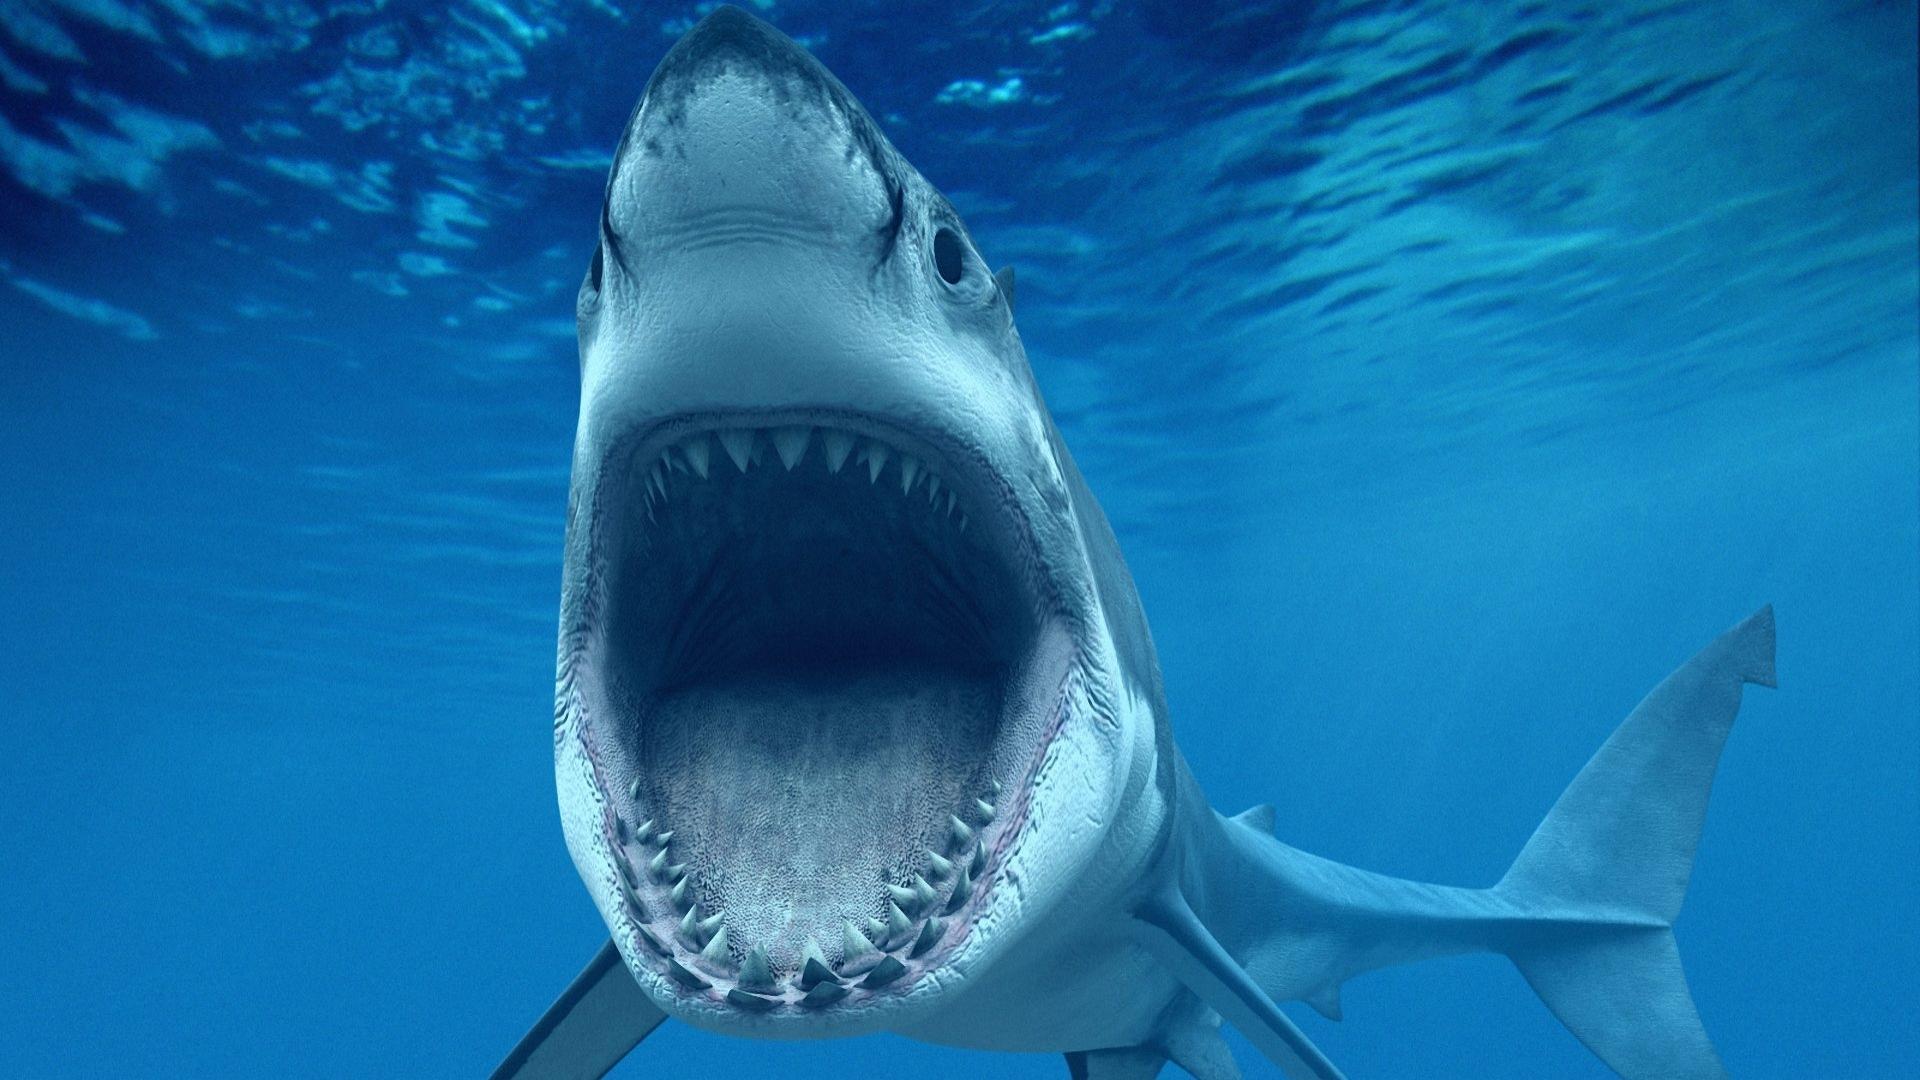 fish wallpaper shark - HD Desktop Wallpapers   4k HD